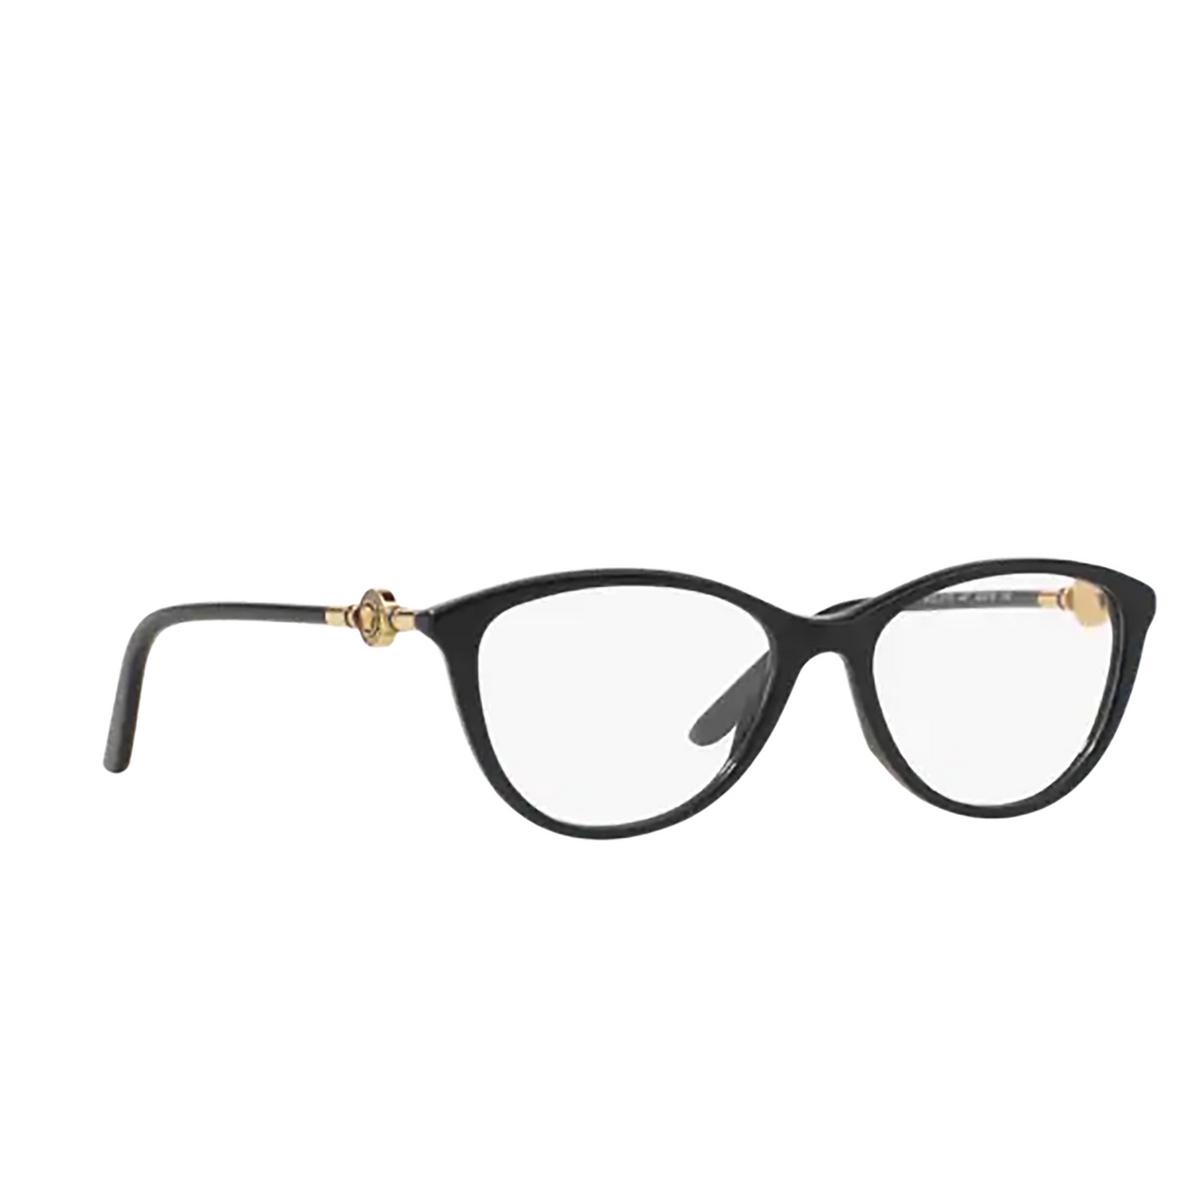 Versace® Oval Eyeglasses: VE3175 color Black GB1 - three-quarters view.